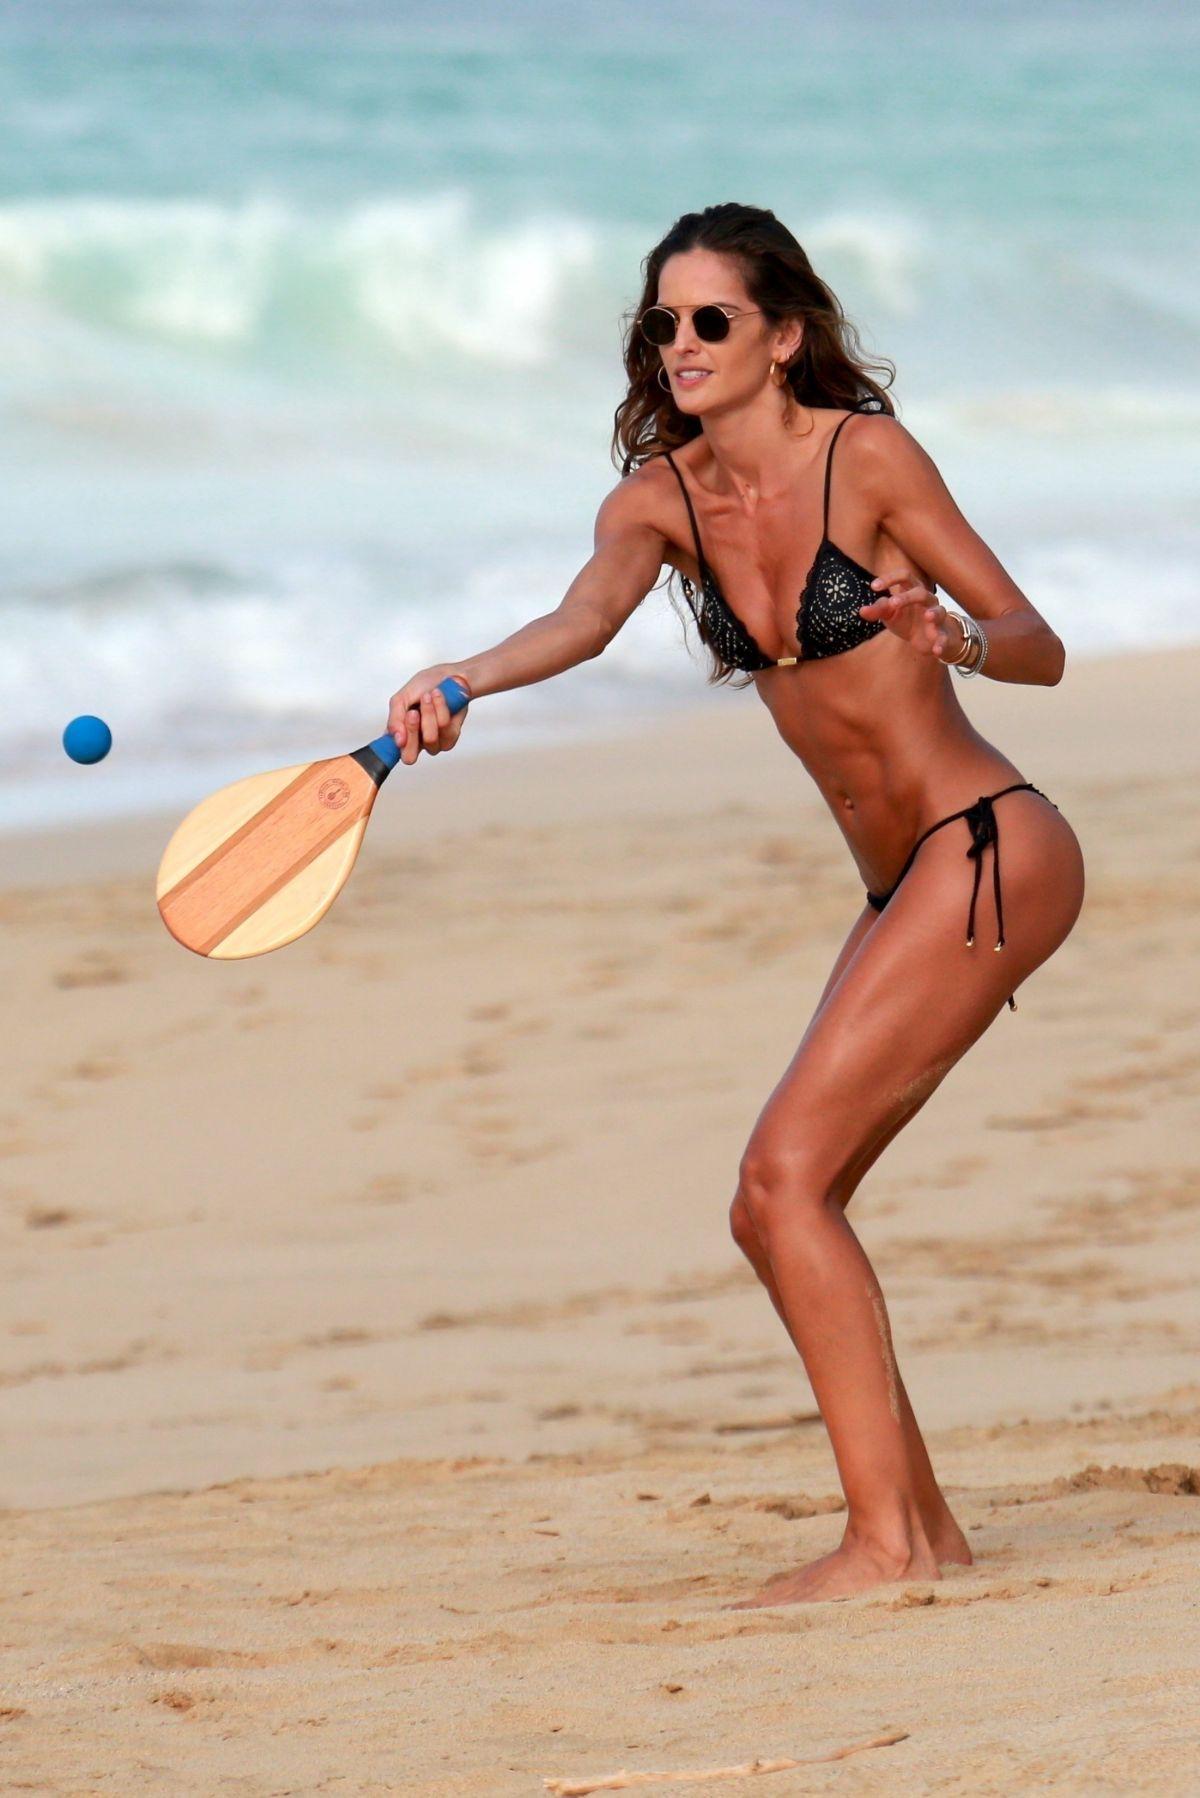 Izabel Goulart in Bikini and Kevin Trapp on the beach in Fernando de Noronha Pic 11 of 35